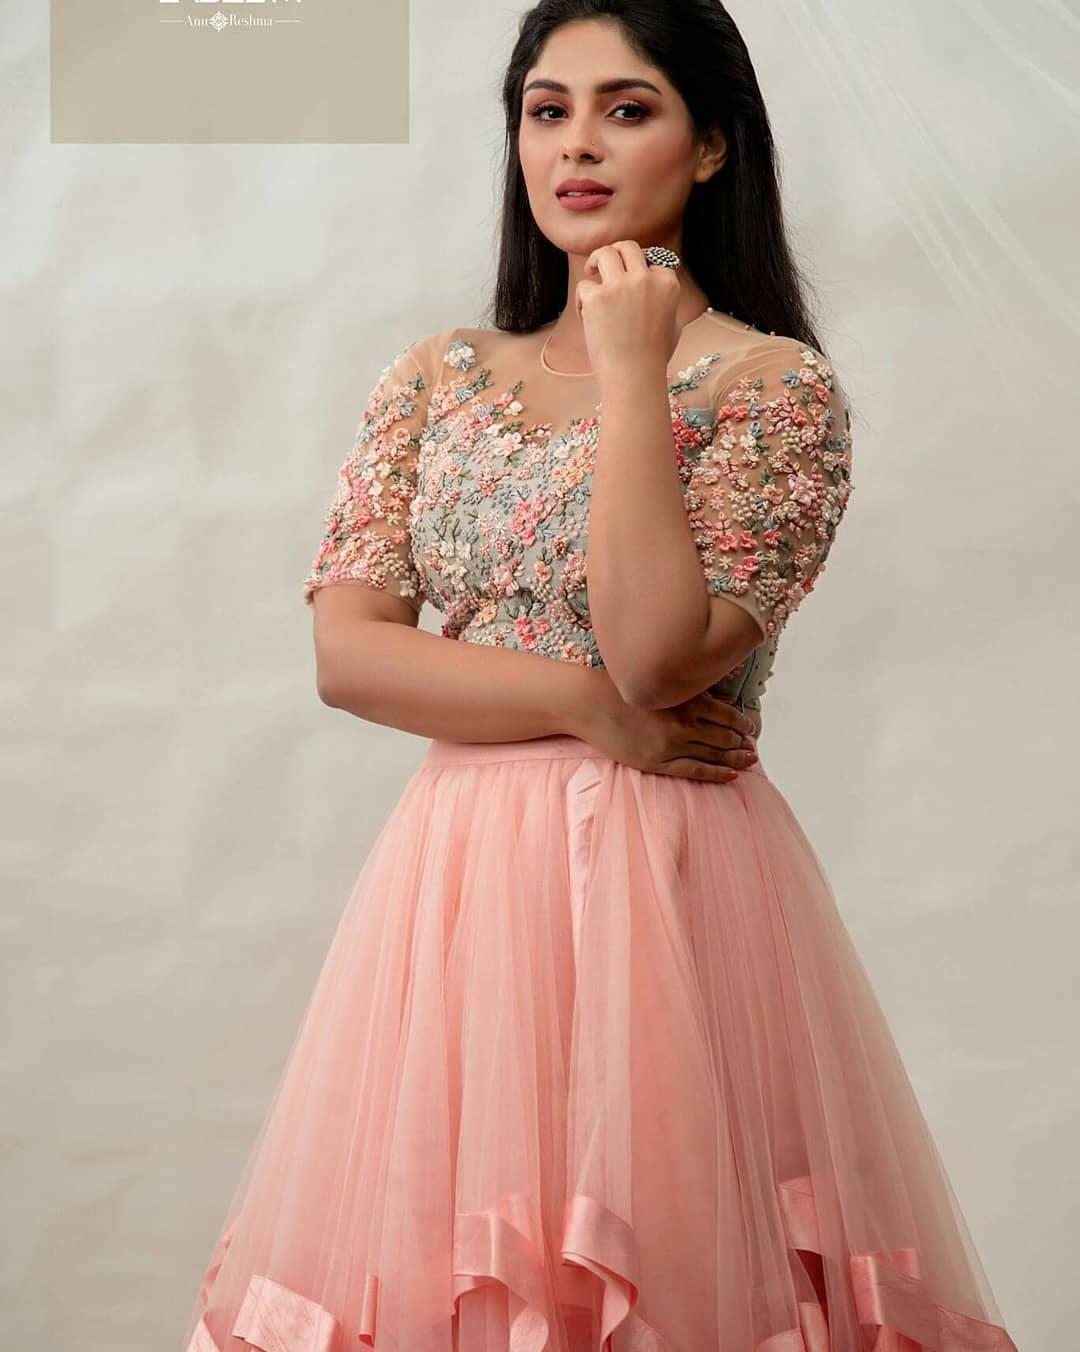 Samyuktha menon photo shoot for label m designers (15)